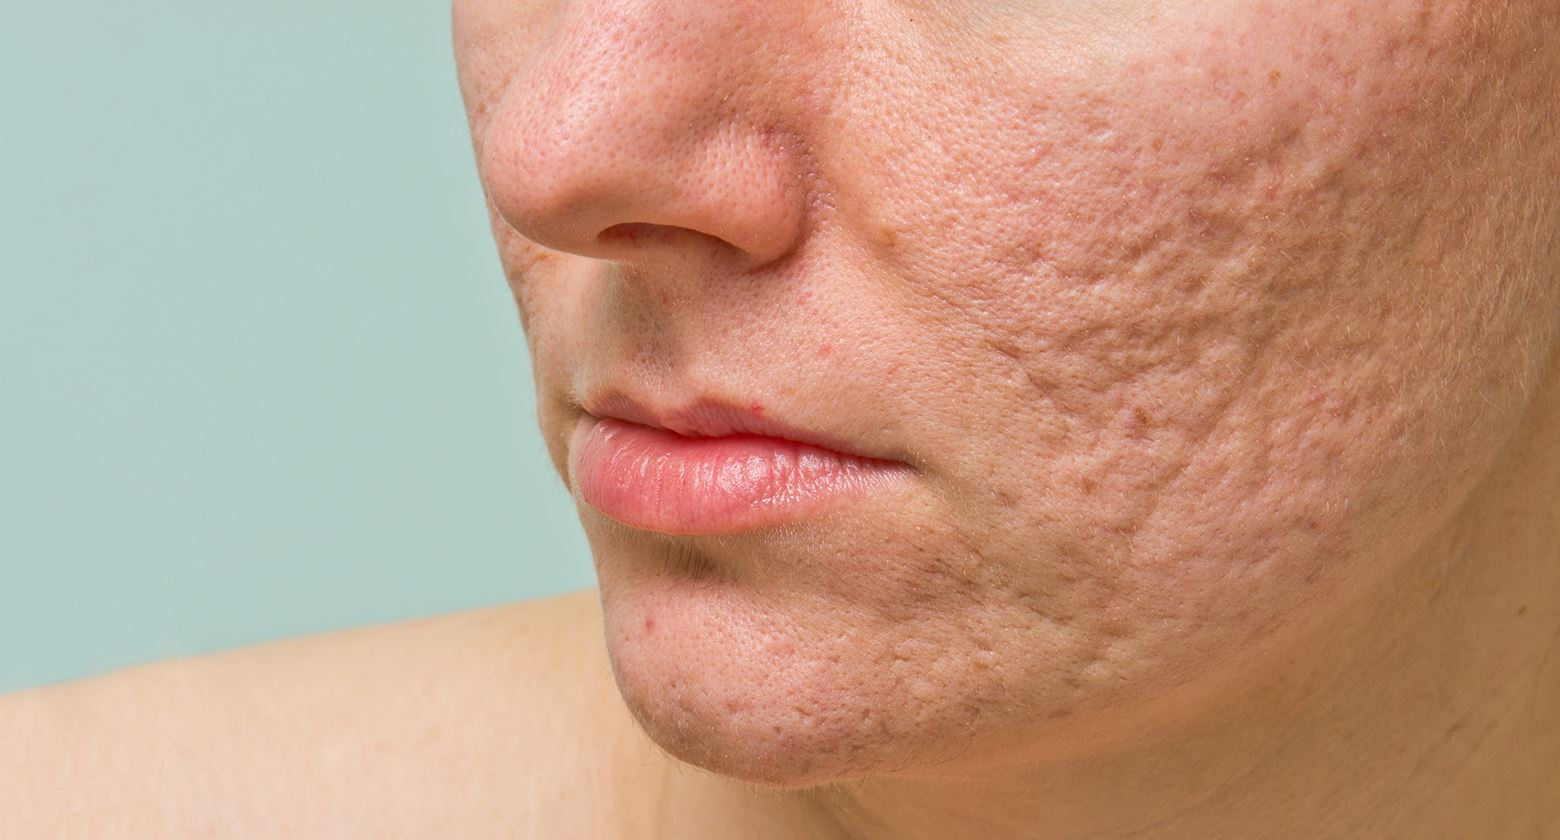 acne scar treatment in chennai